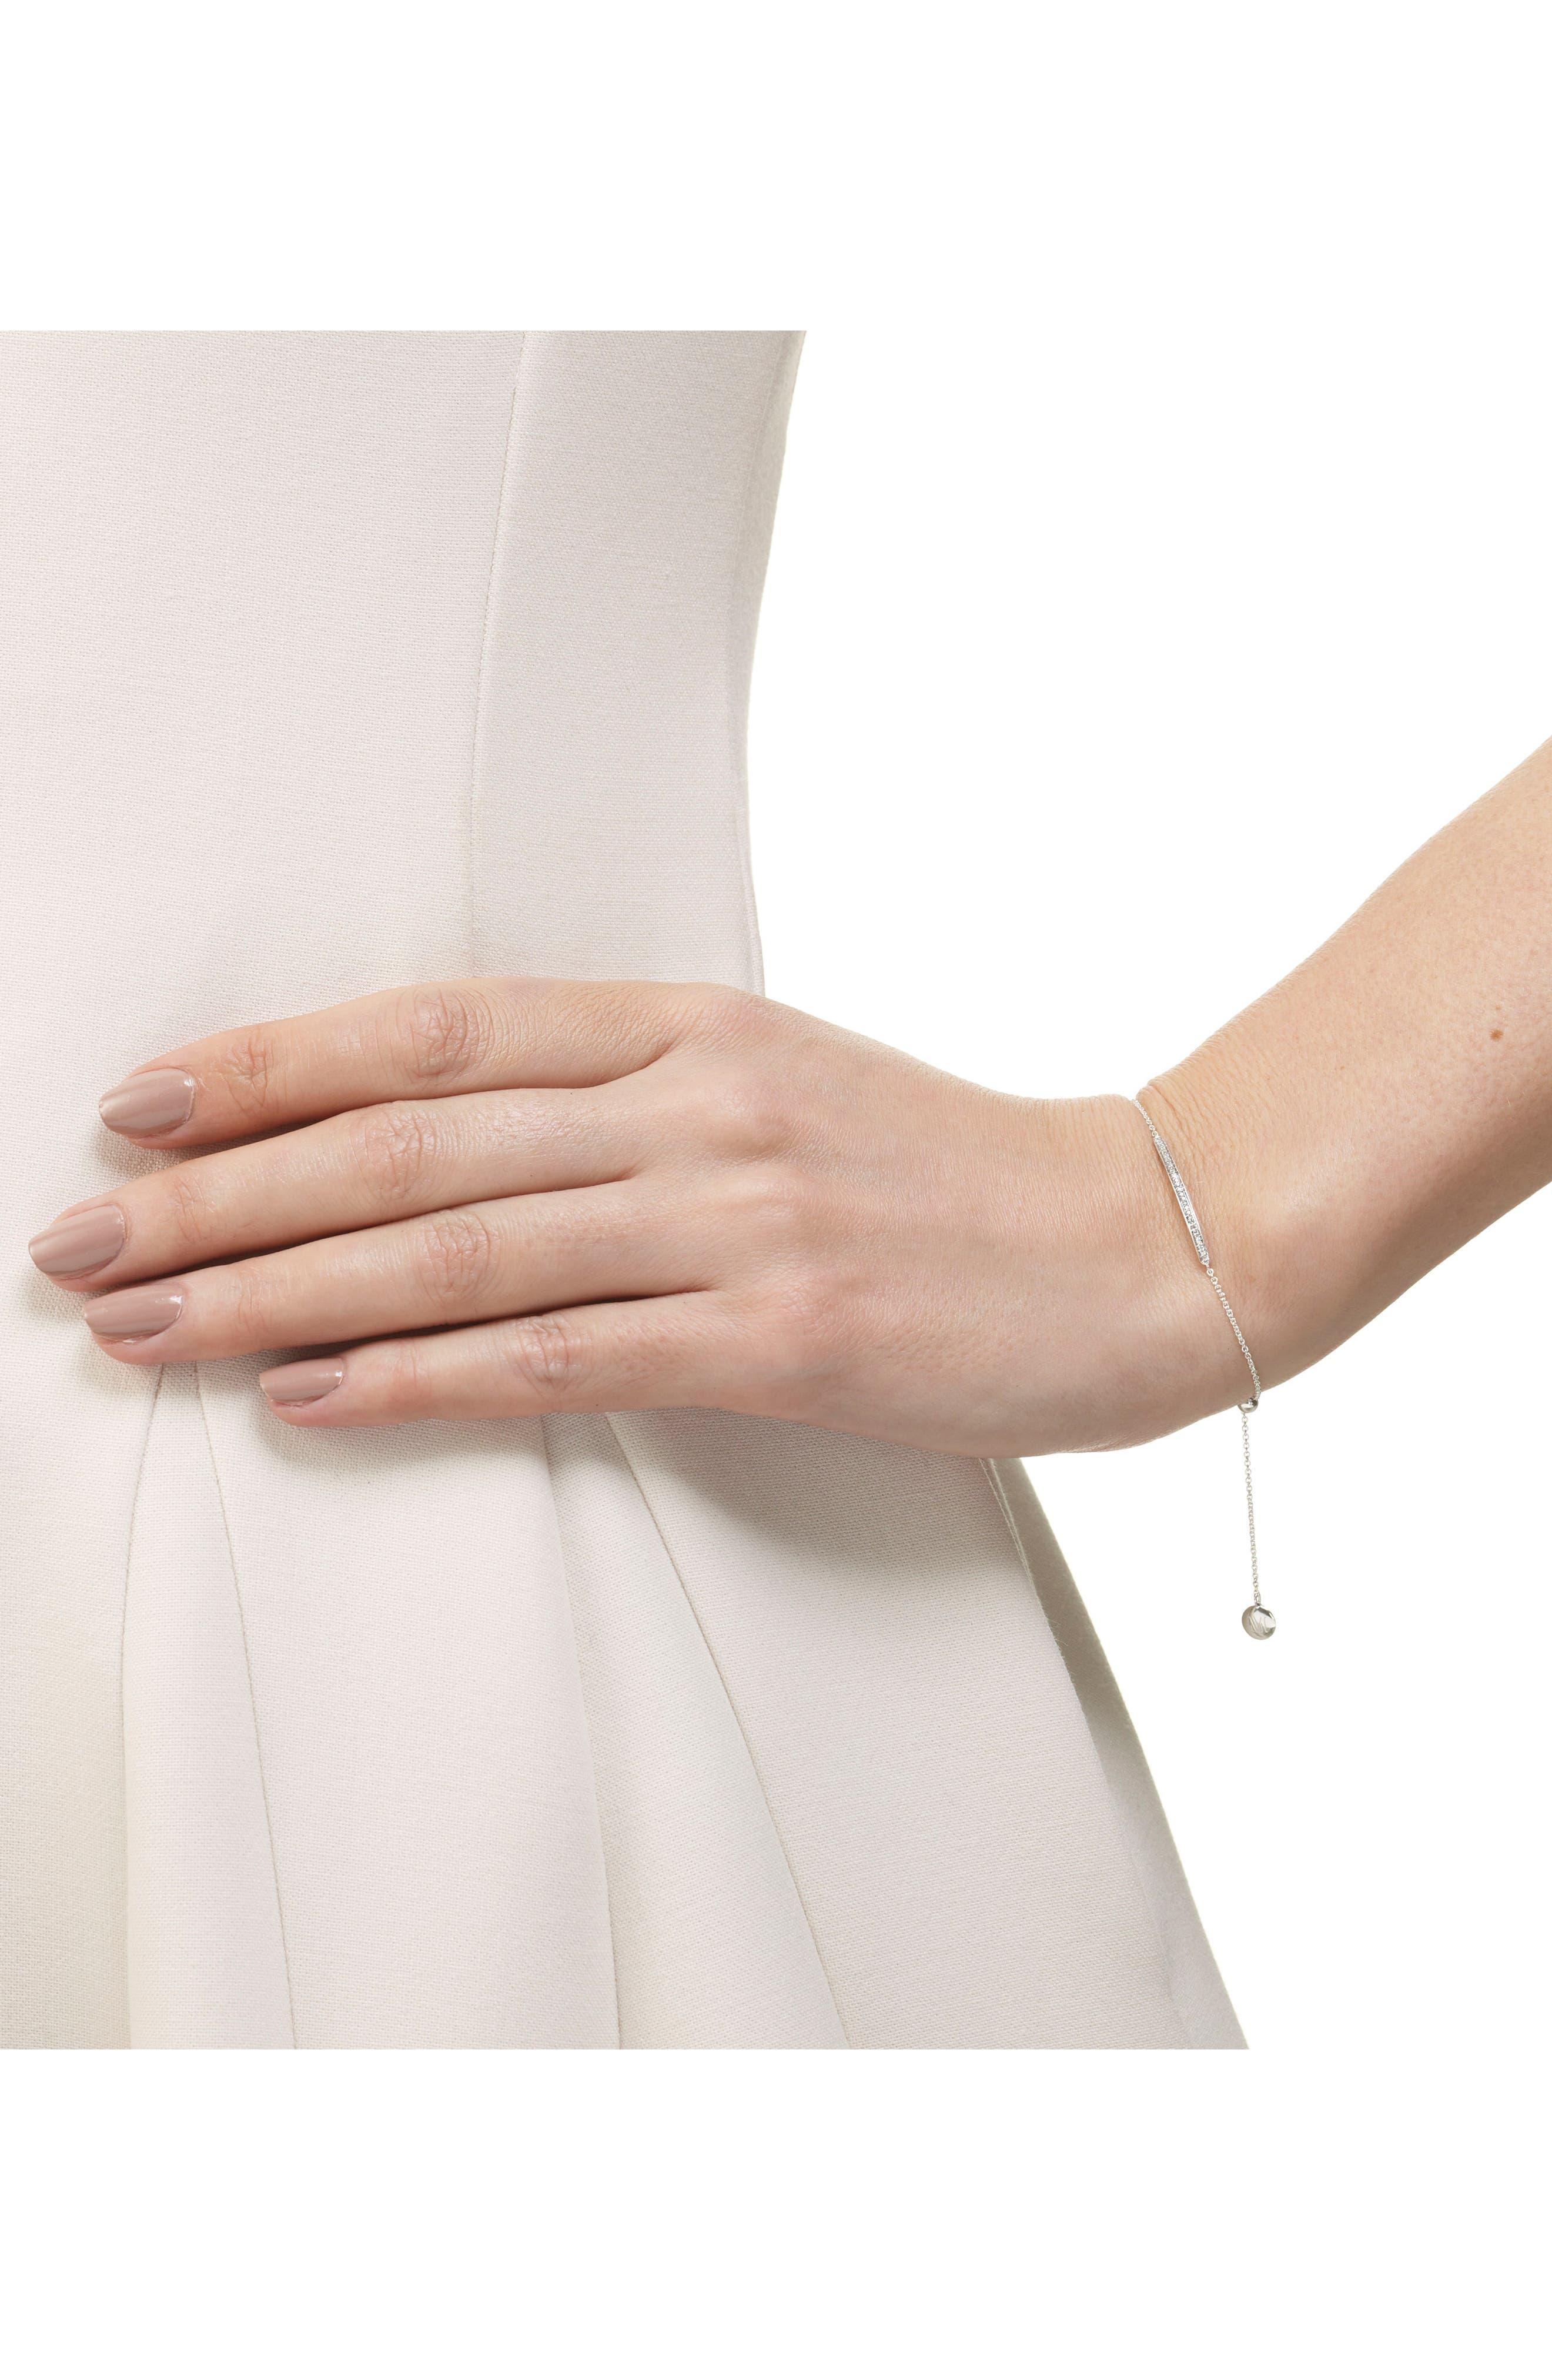 MONICA VINADER, Skinny Diamond Bracelet, Alternate thumbnail 2, color, SILVER/ DIAMOND